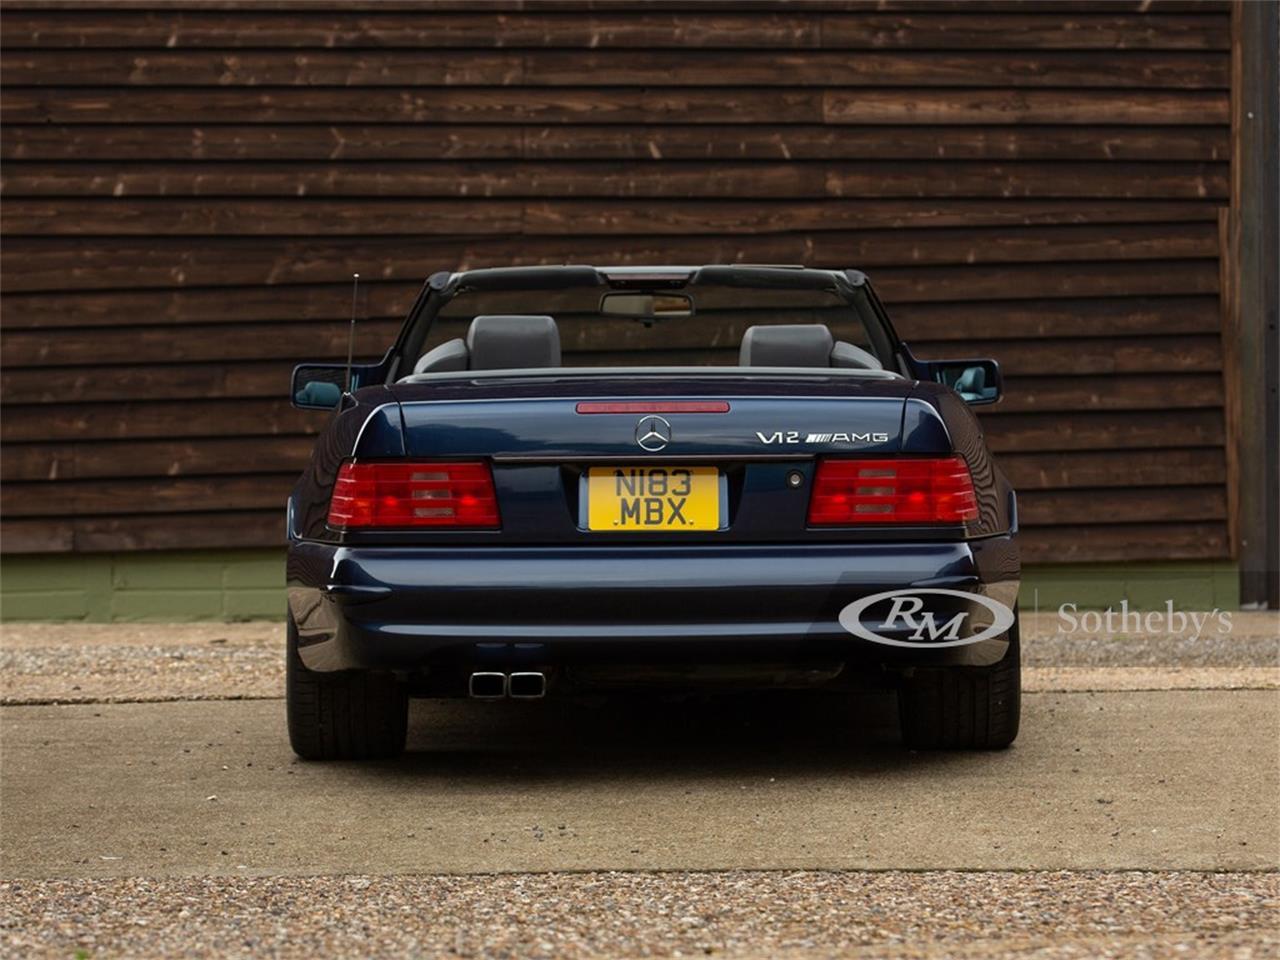 1996 Mercedes-Benz SL-Class (CC-1413892) for sale in London, United Kingdom